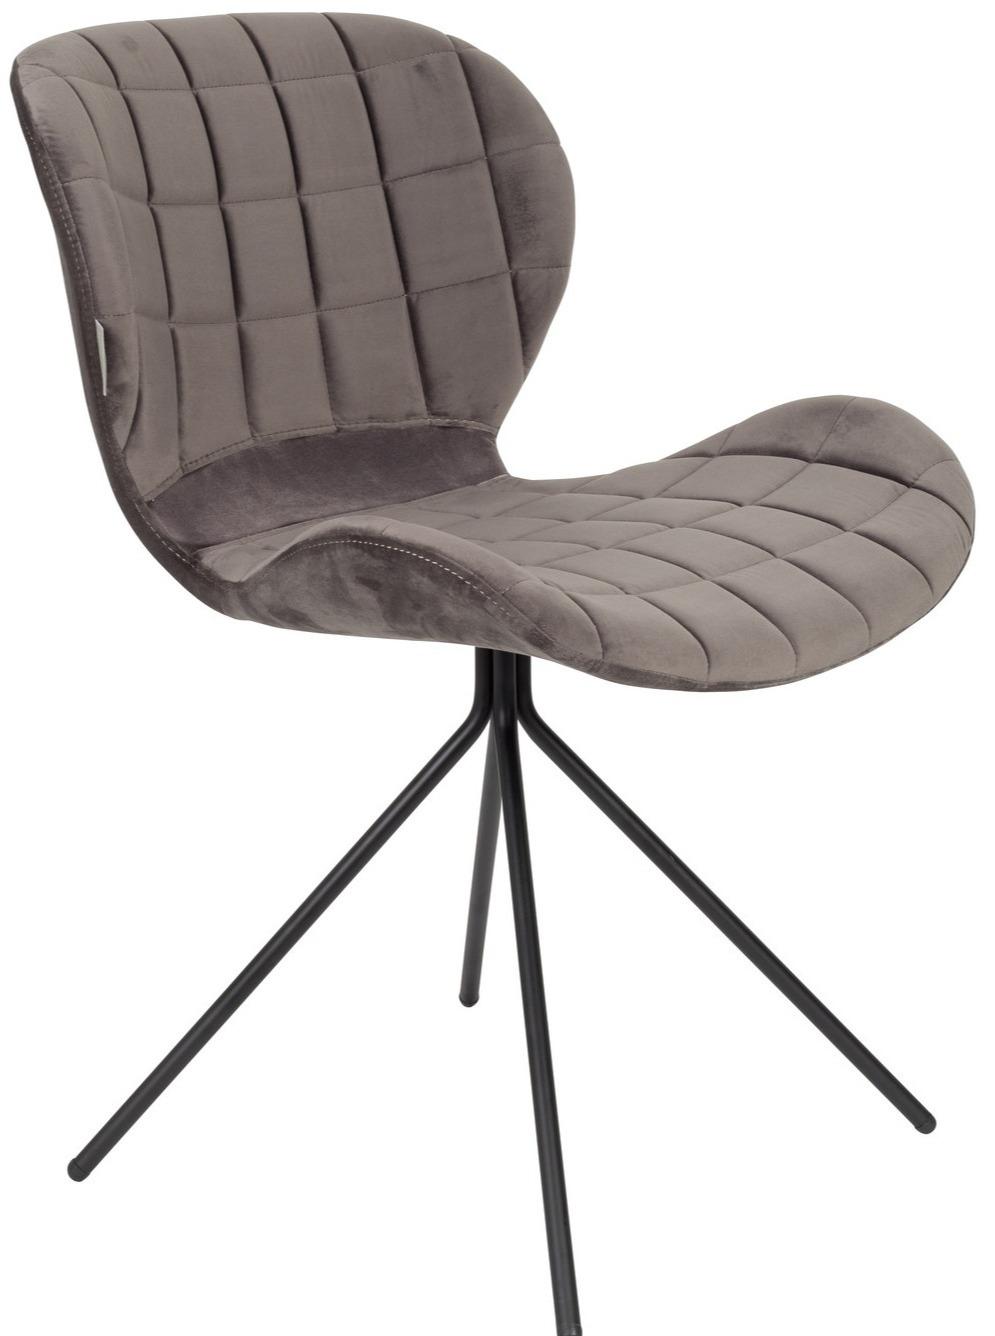 Krzesło biurowe OMG szare, Zuiver Meble sklep meble.pl